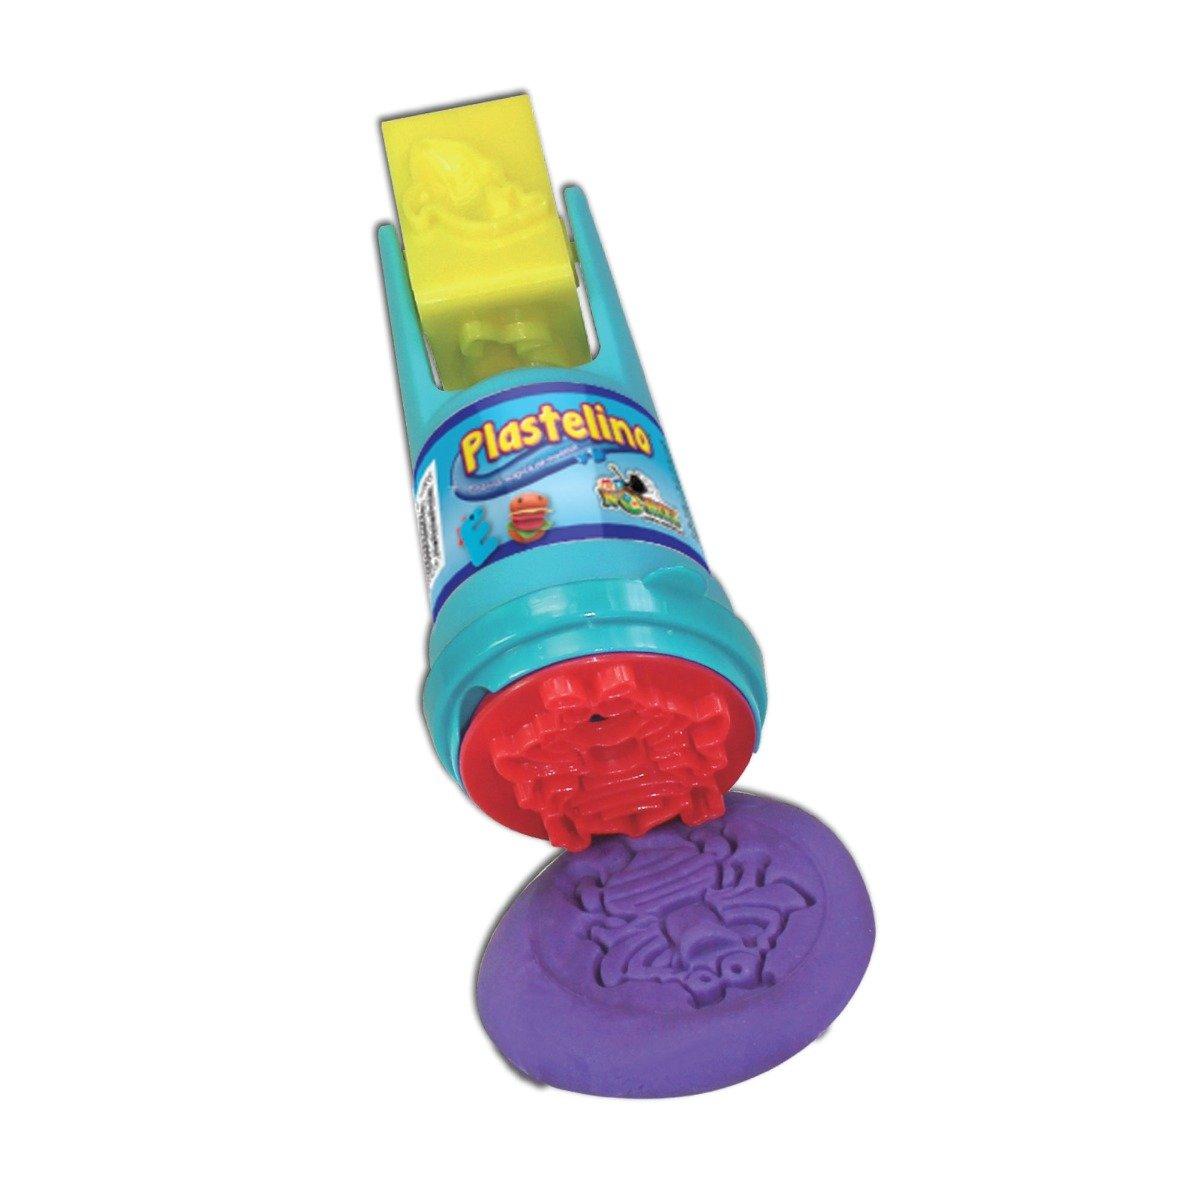 Plastelino - Tub rola cu stampila si plastilina - Galben